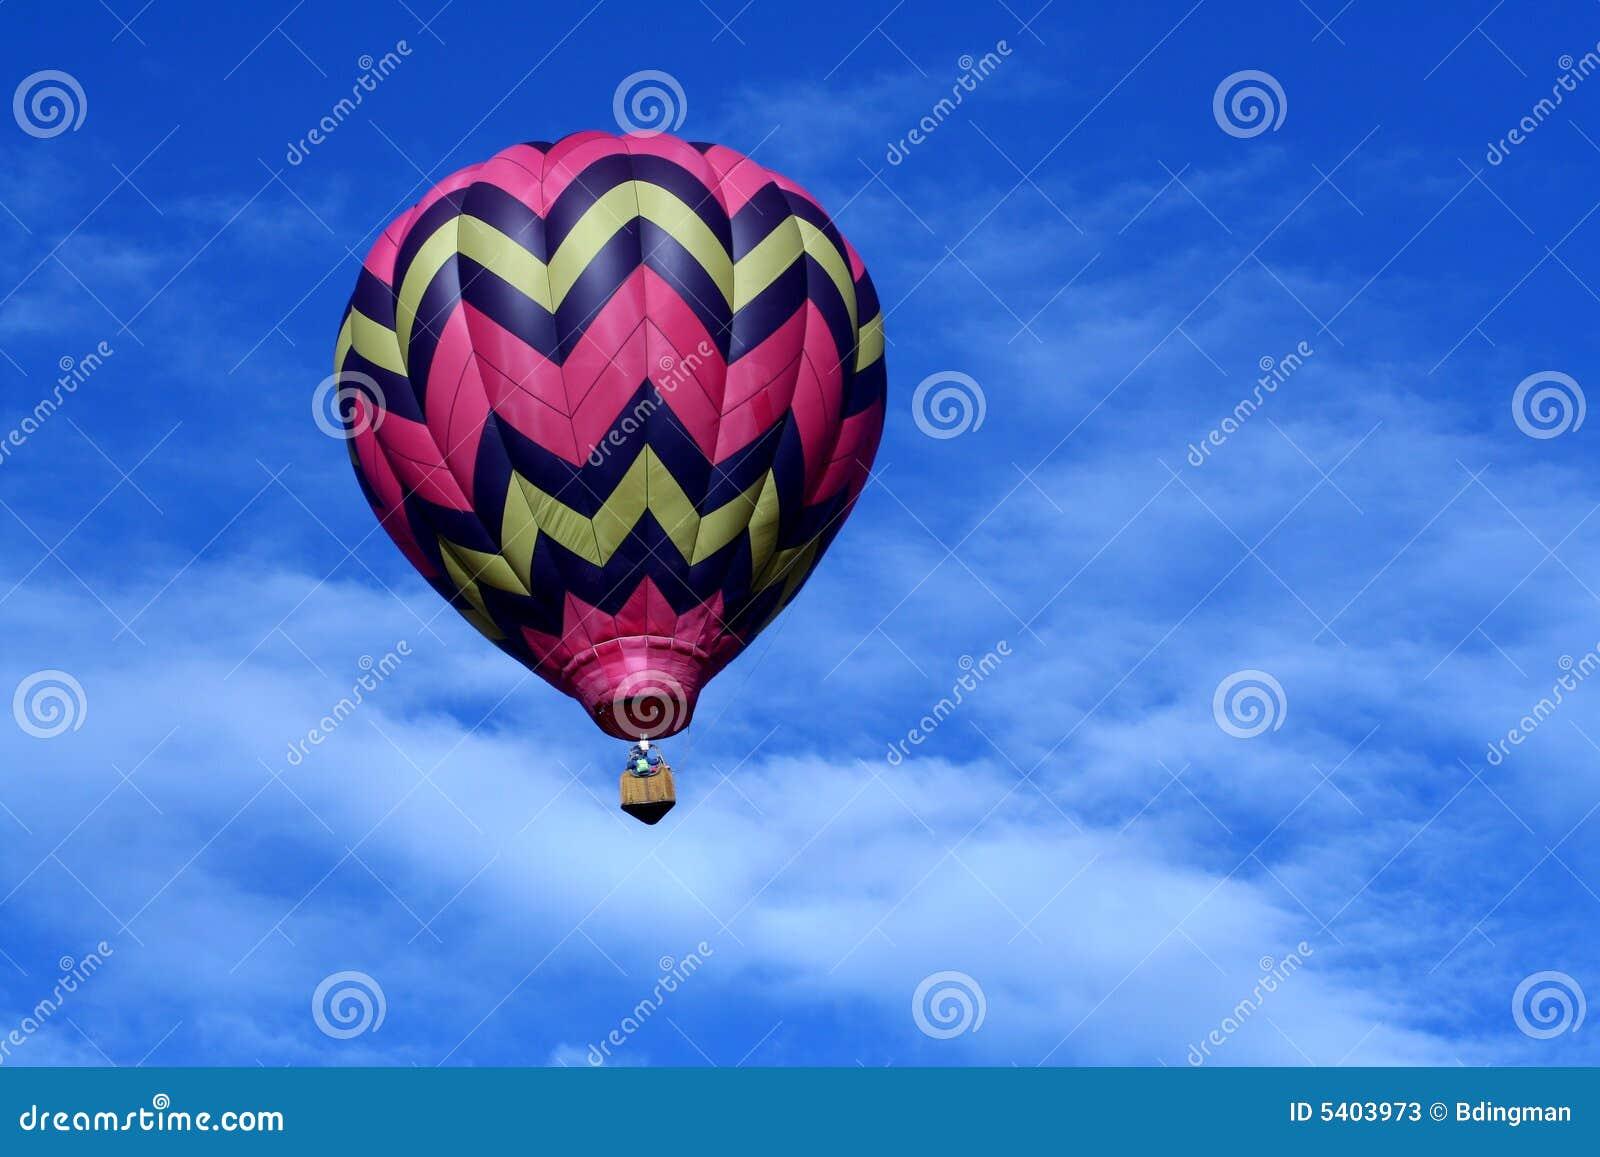 Pink Hot Air Balloon